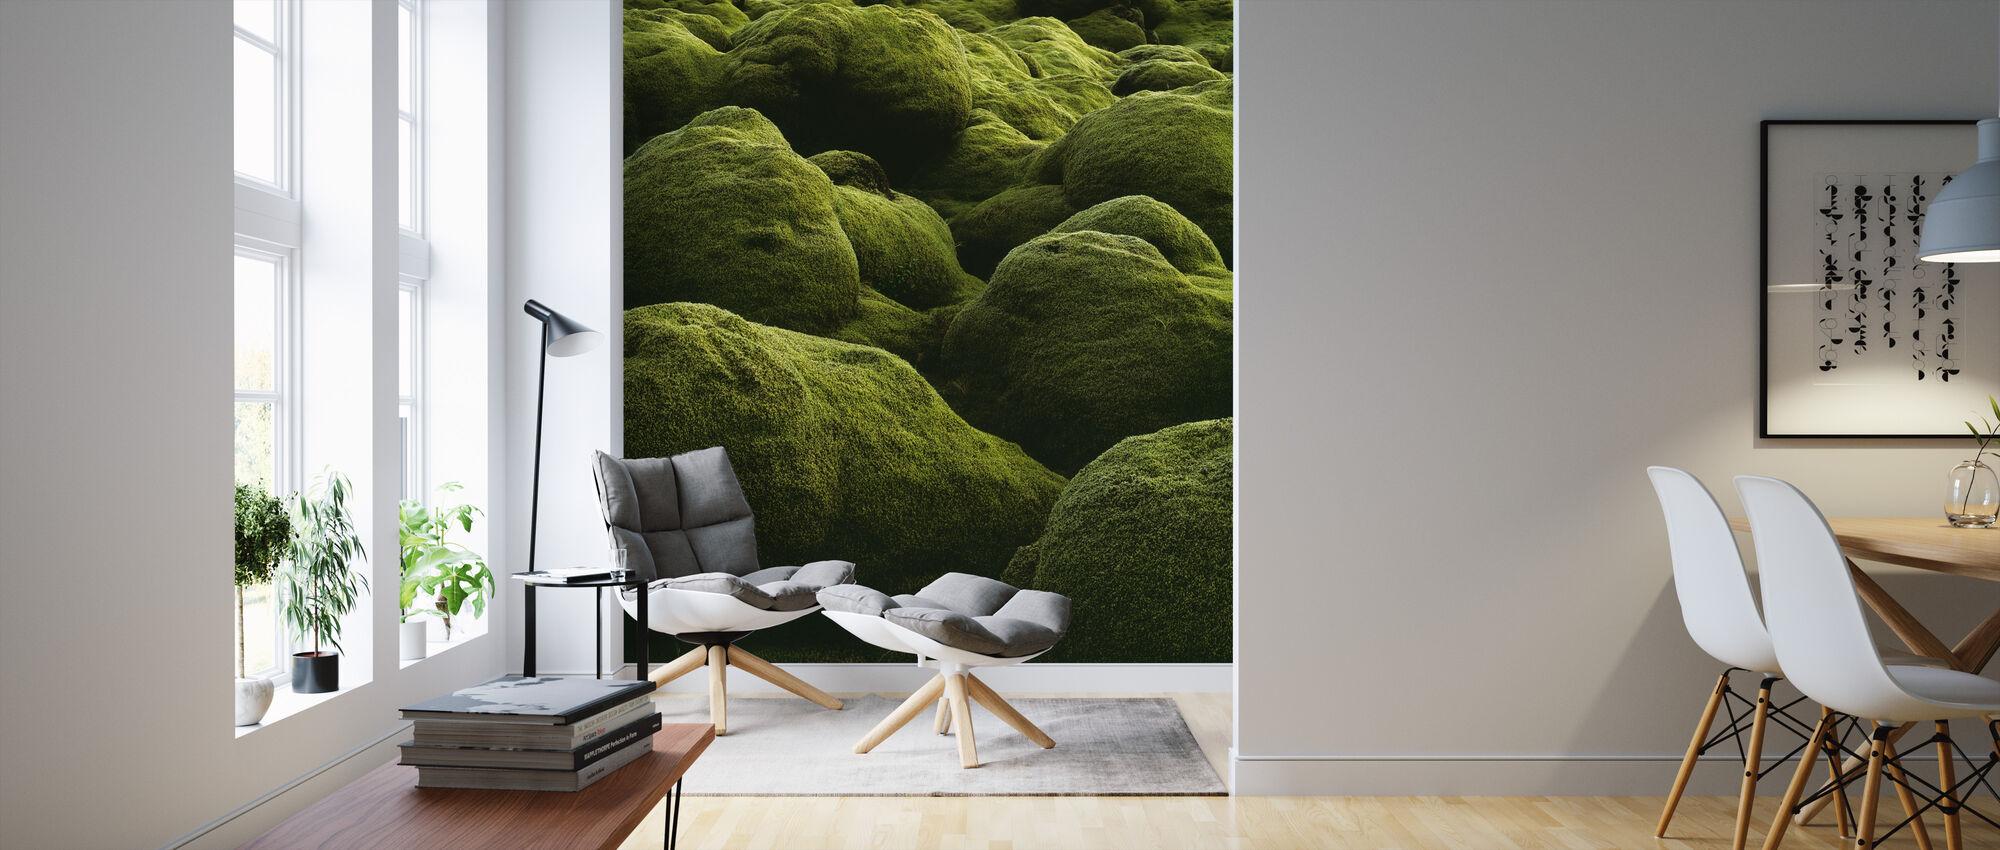 Stones of Iceland - Wallpaper - Living Room